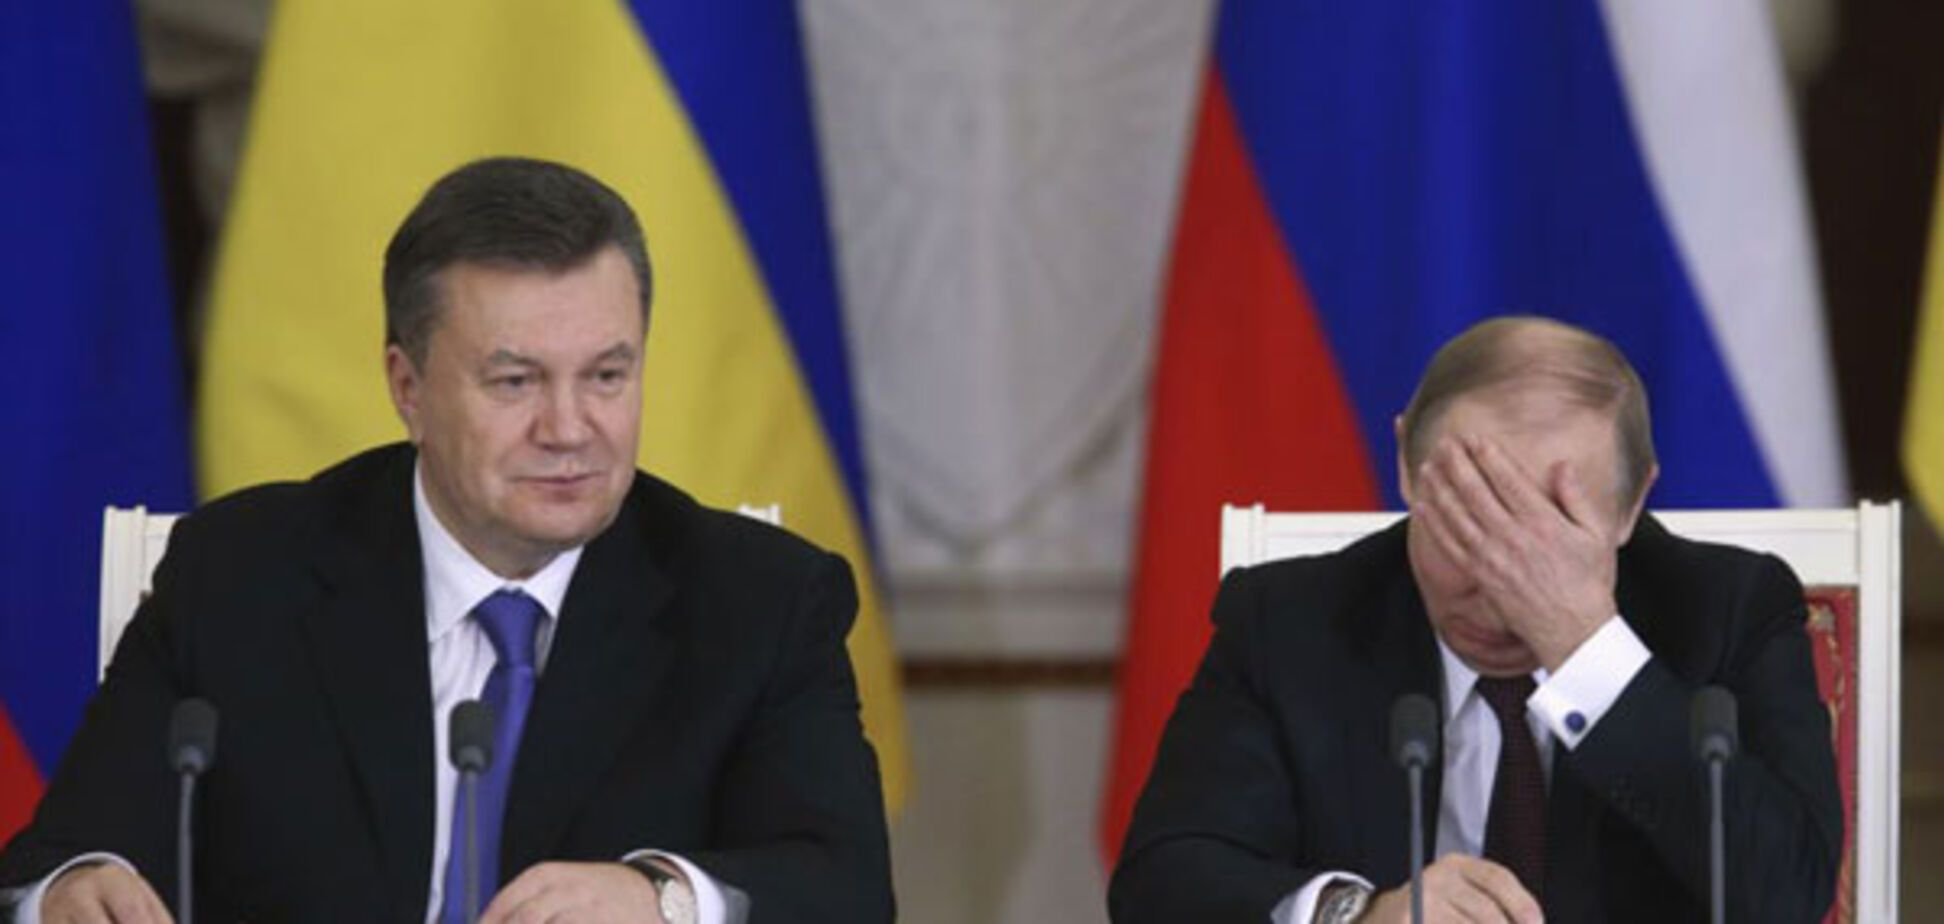 'Путин, введи войска': Украине передали важную улику по делу Януковича